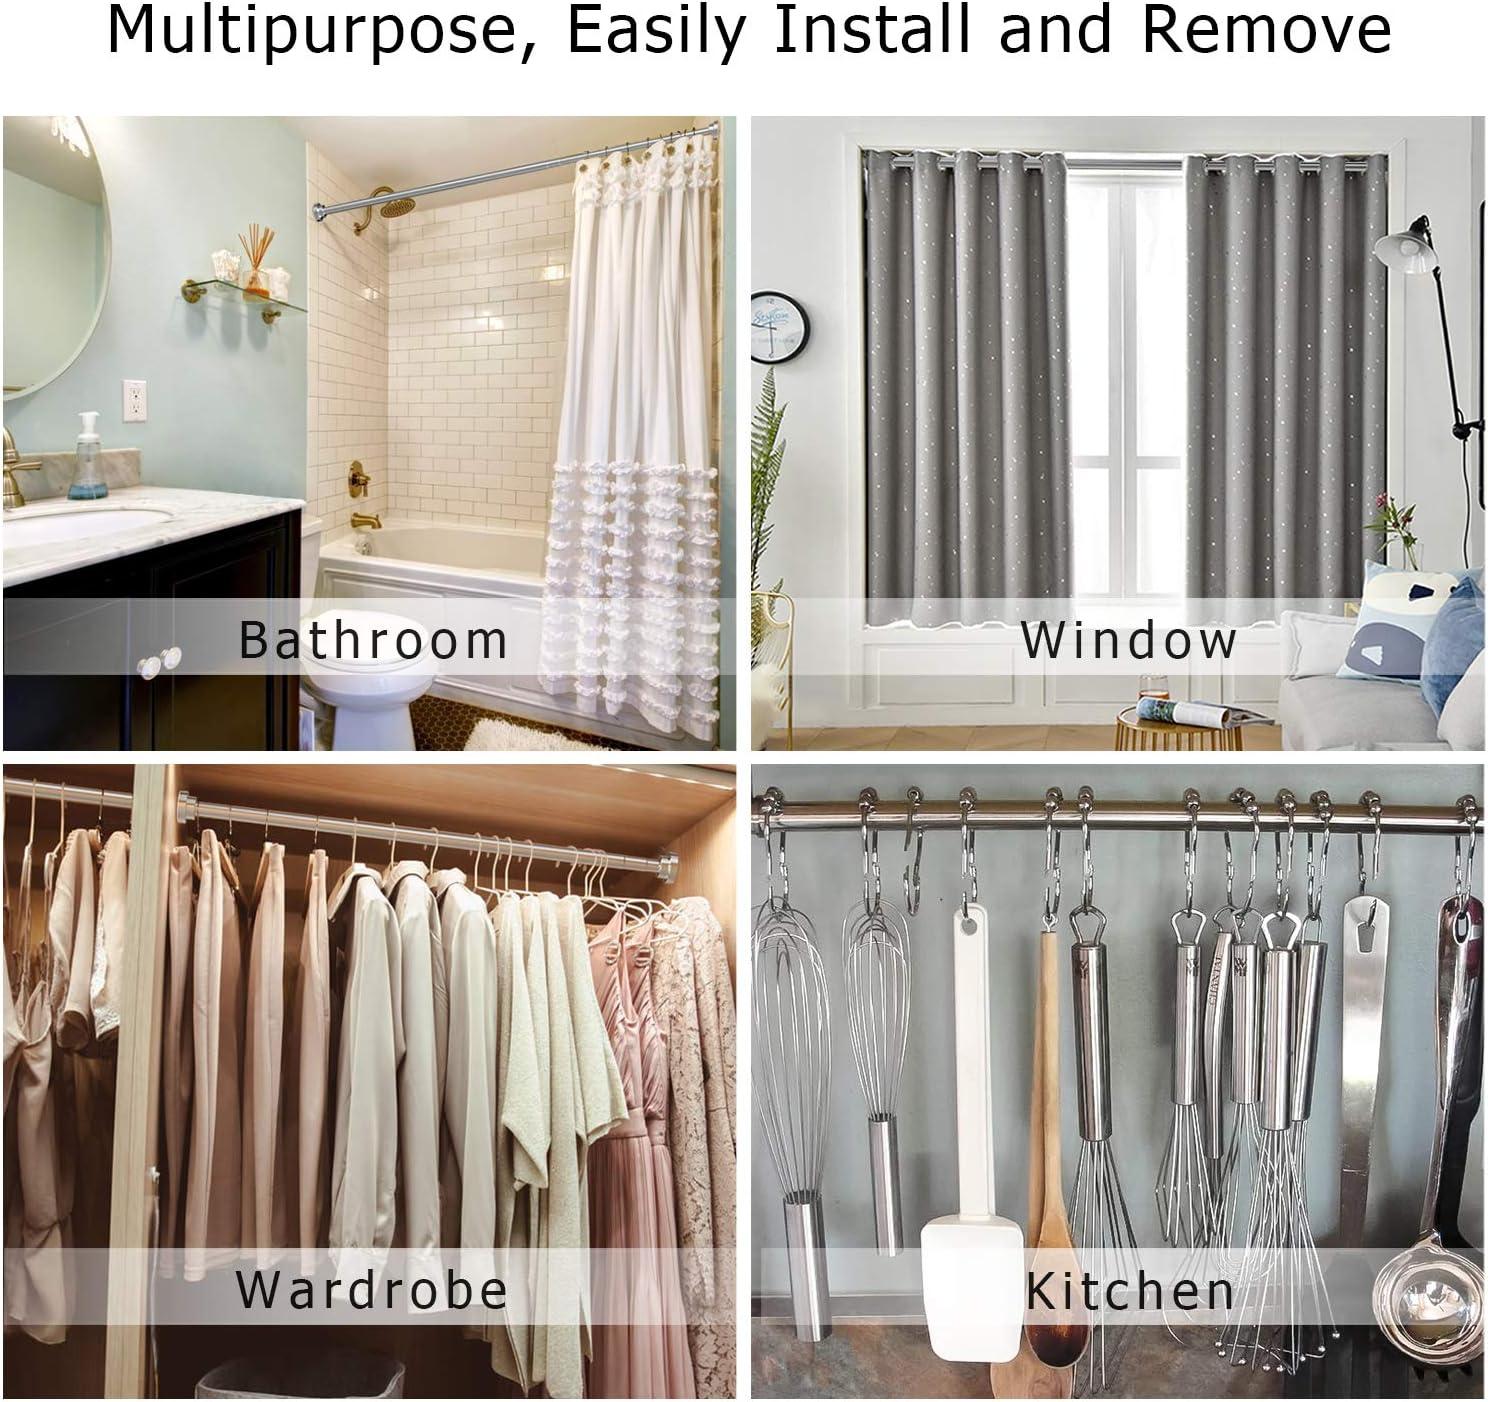 61-114 ALLRIER Tension Shower Curtain Rod Chrome No Drilling Stainless Steel Shower Rod Never Rust Non-Slip Adjustable Closet Rod Tension Rod for Bathroom Kitchen Wardrobe Doorway Windows